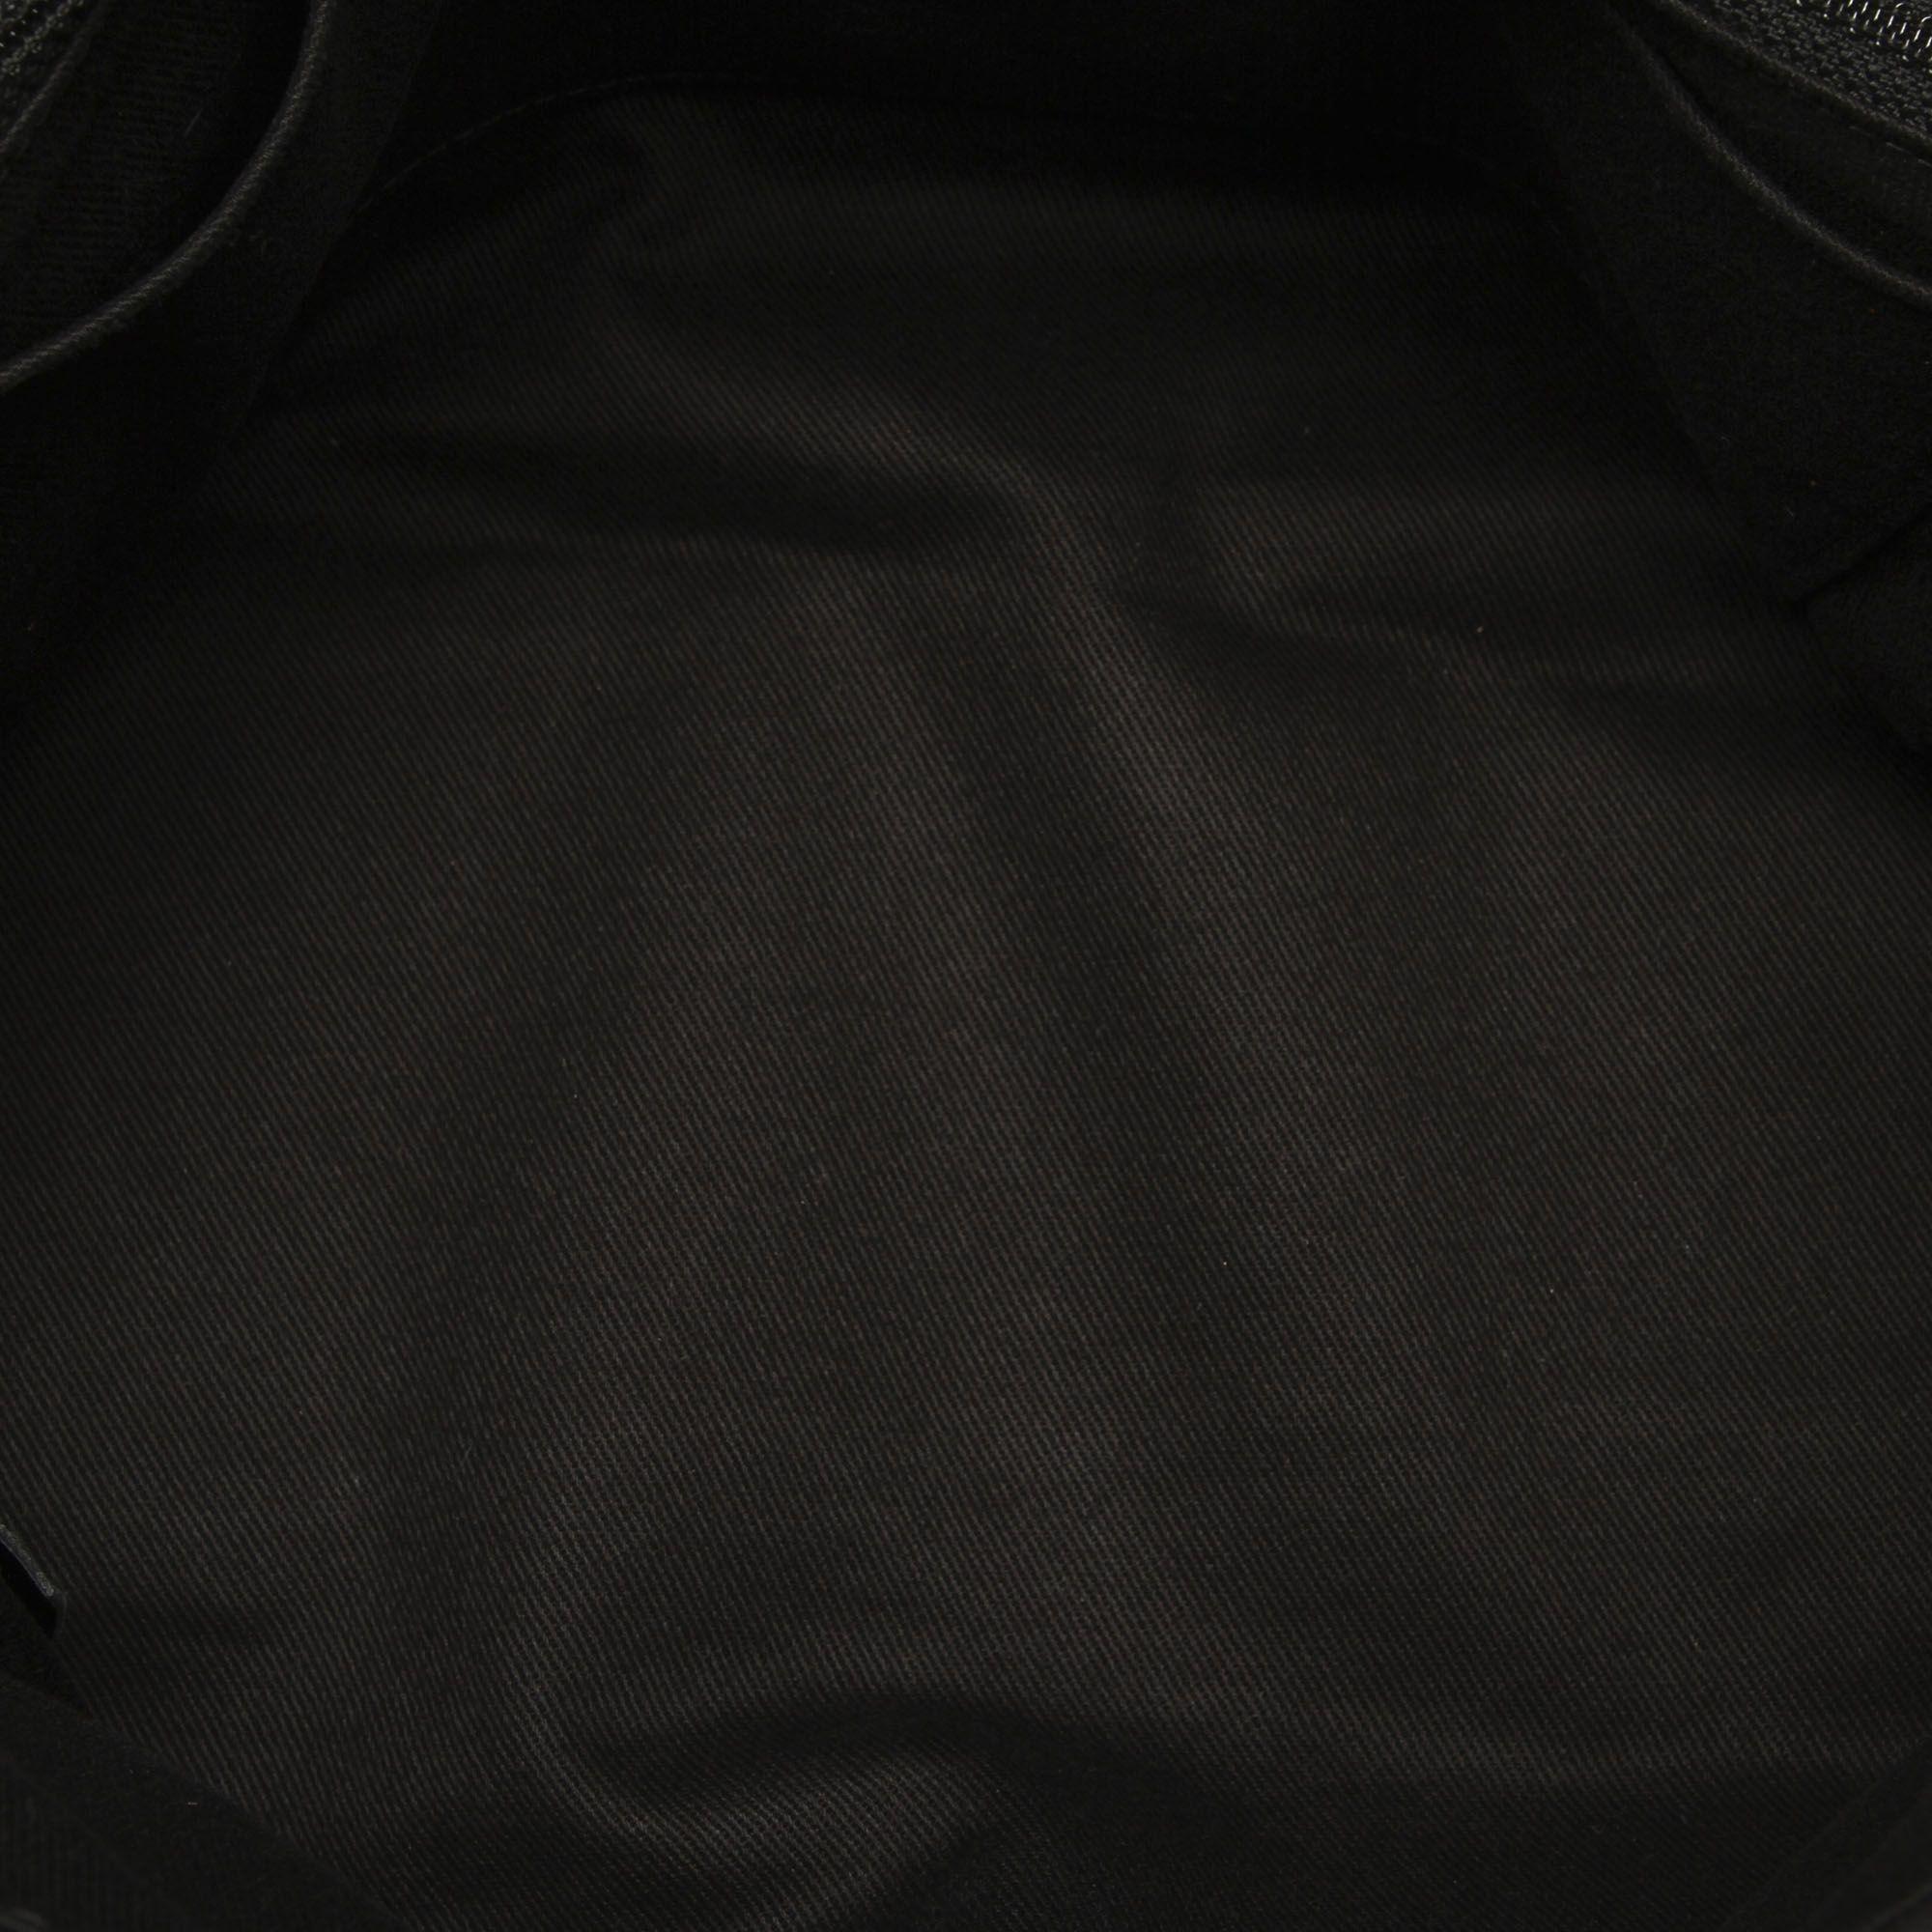 Vintage Chanel Wild Stitch Suede Flap Bag Black